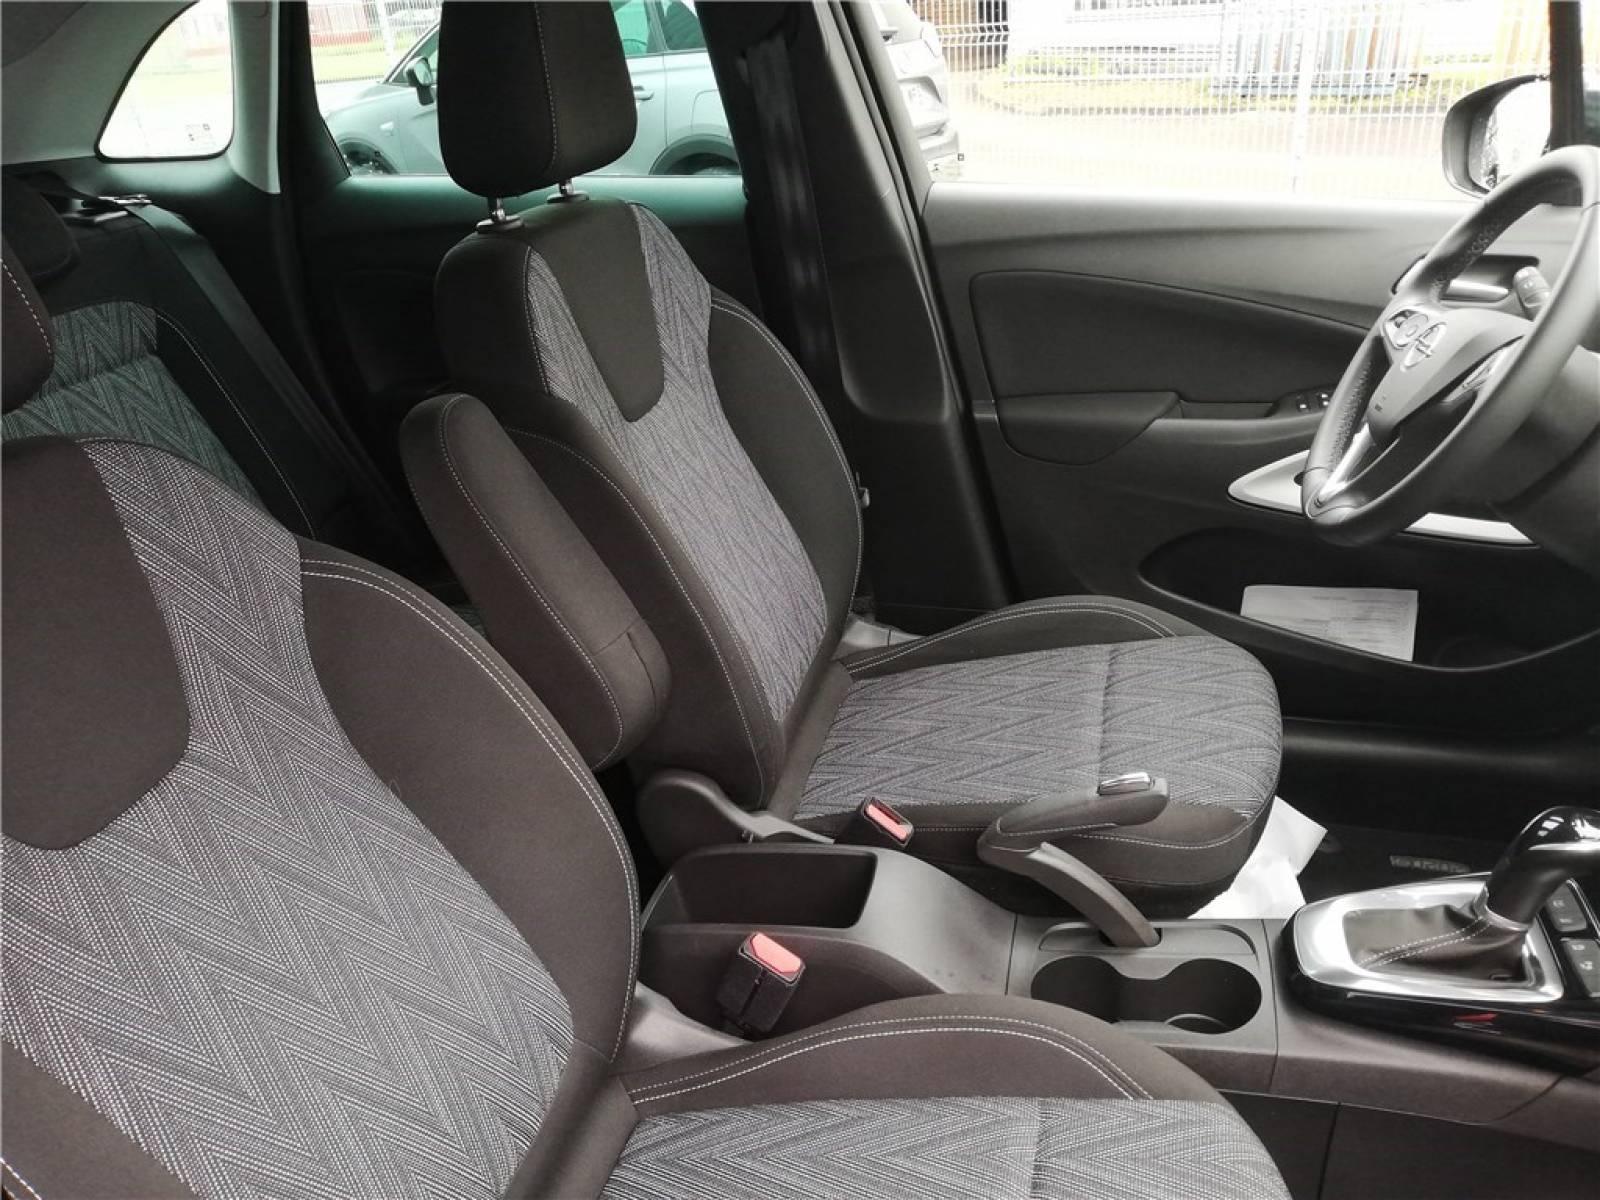 OPEL Crossland X 1.2 Turbo 130 ch BVA6 - véhicule d'occasion - Groupe Guillet - Opel Magicauto - Chalon-sur-Saône - 71380 - Saint-Marcel - 21